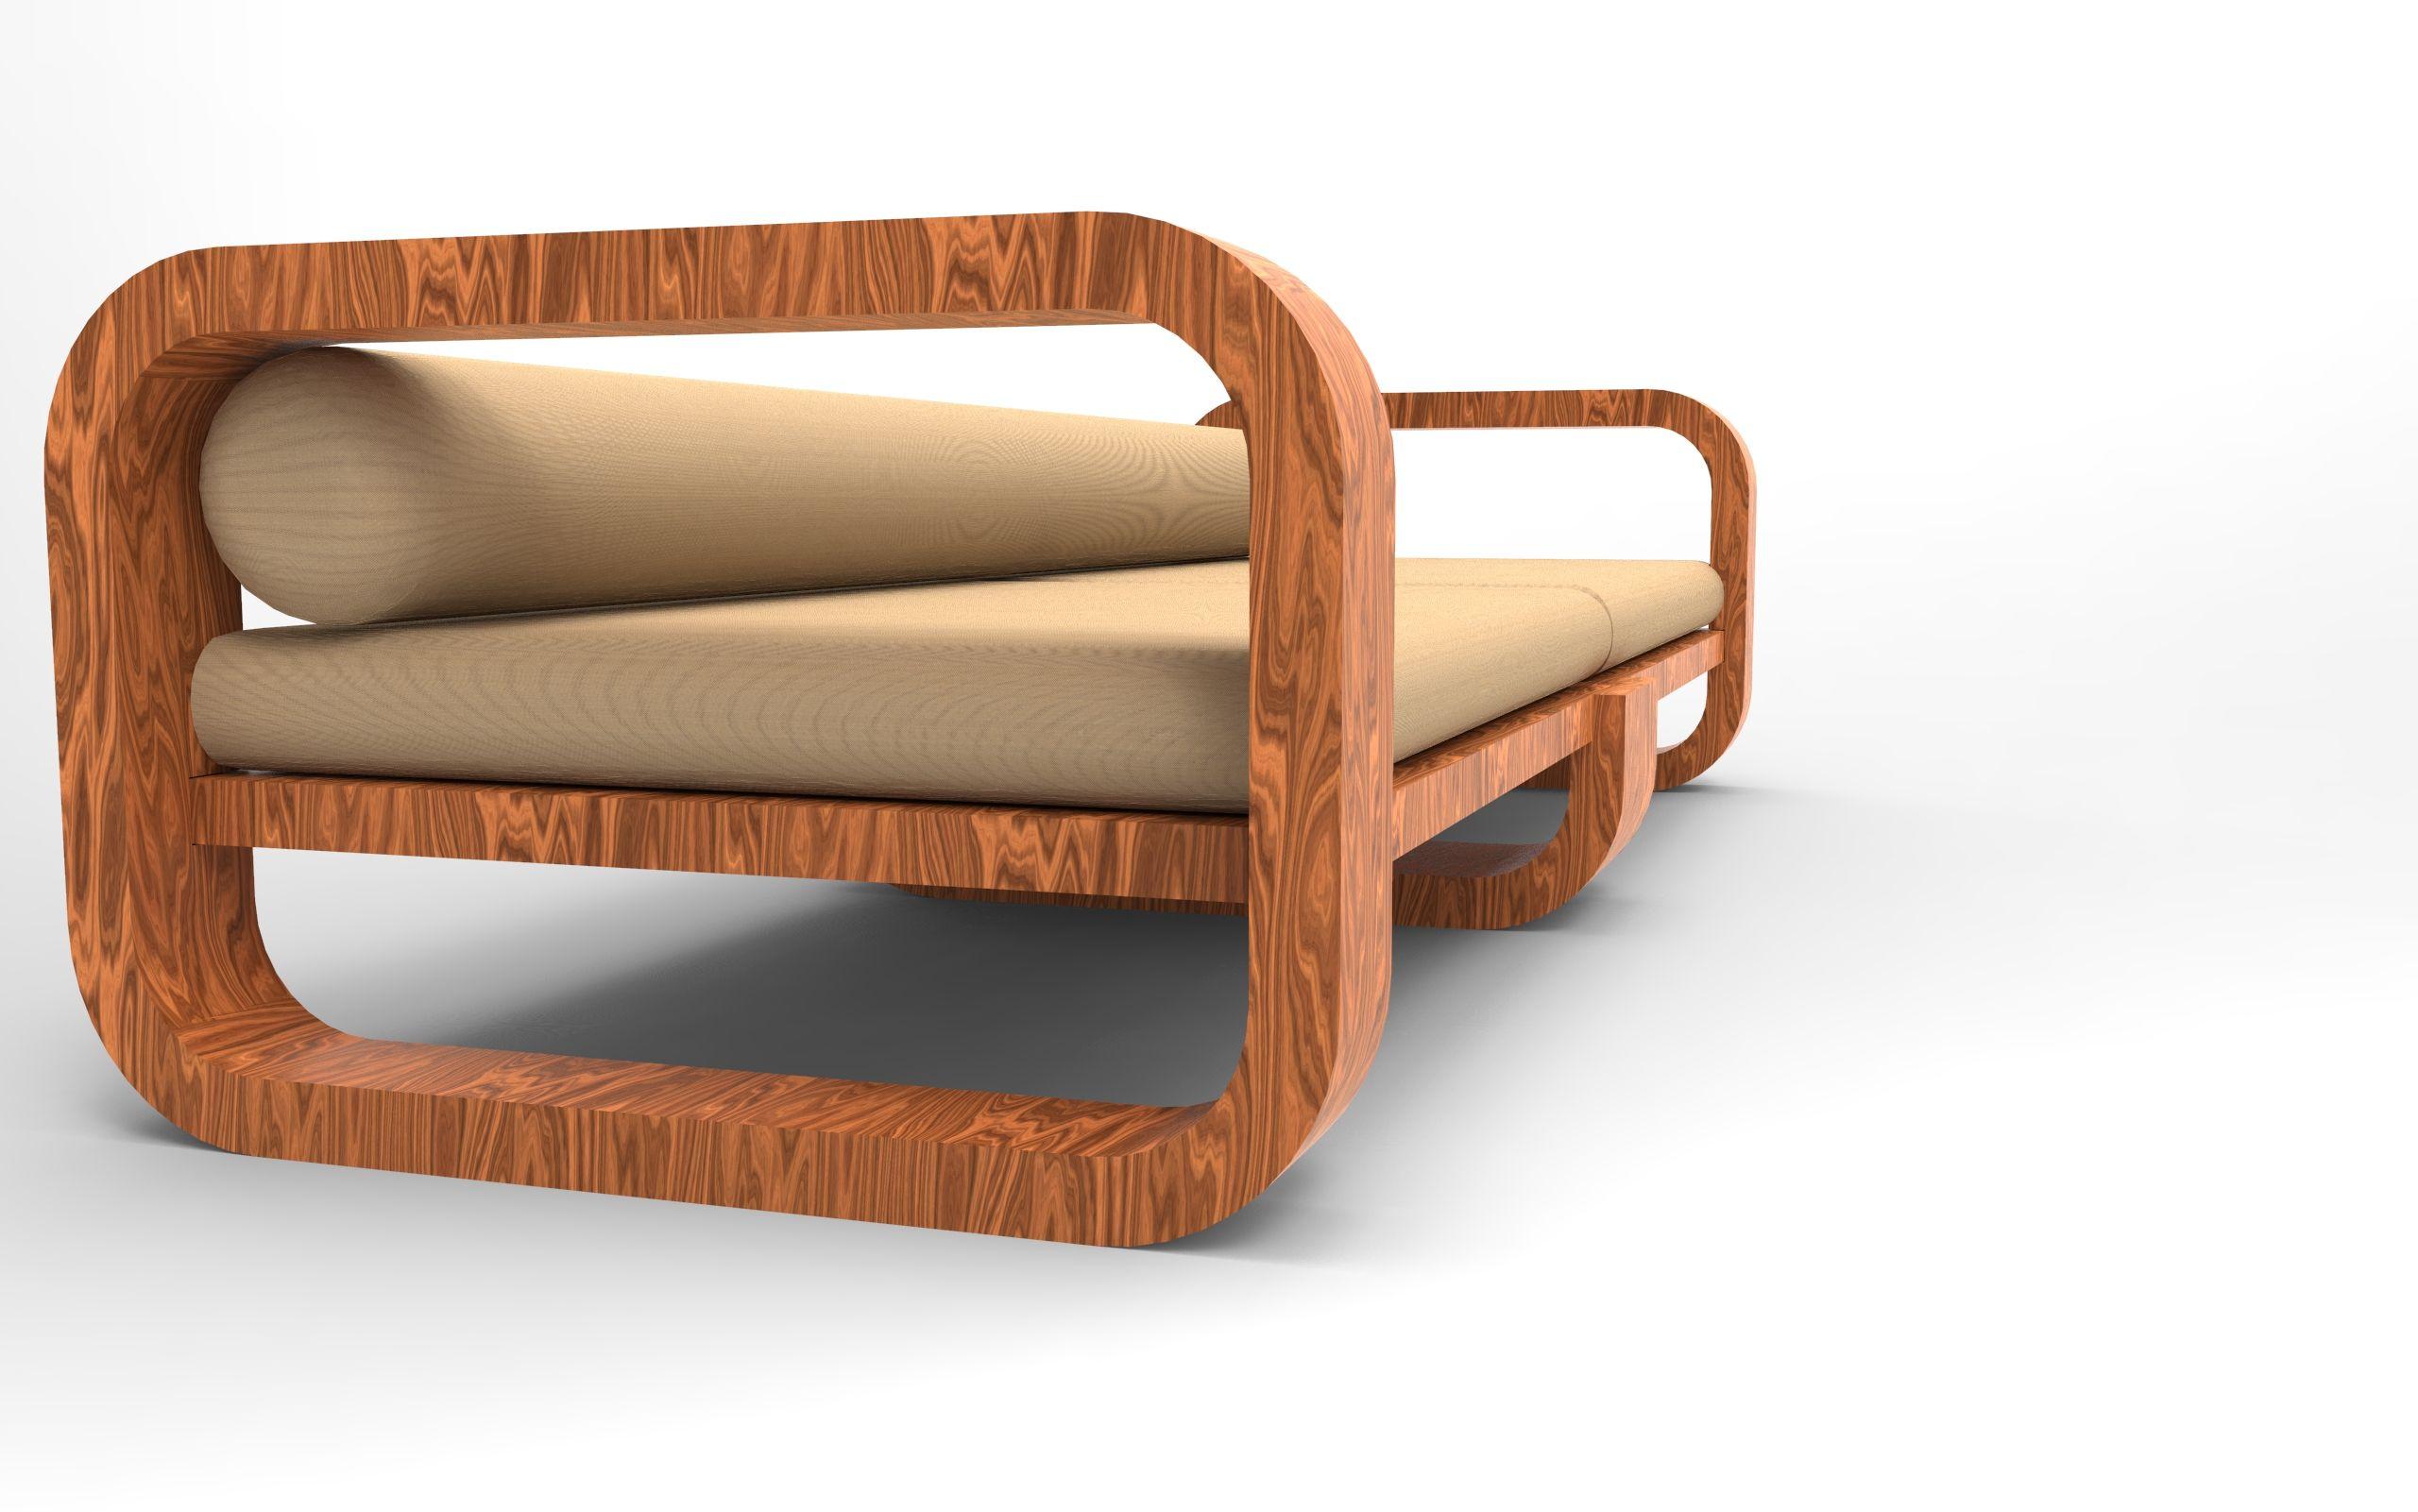 Design-couch-fabricadenerdes---lucas-lira-02-3500-3500